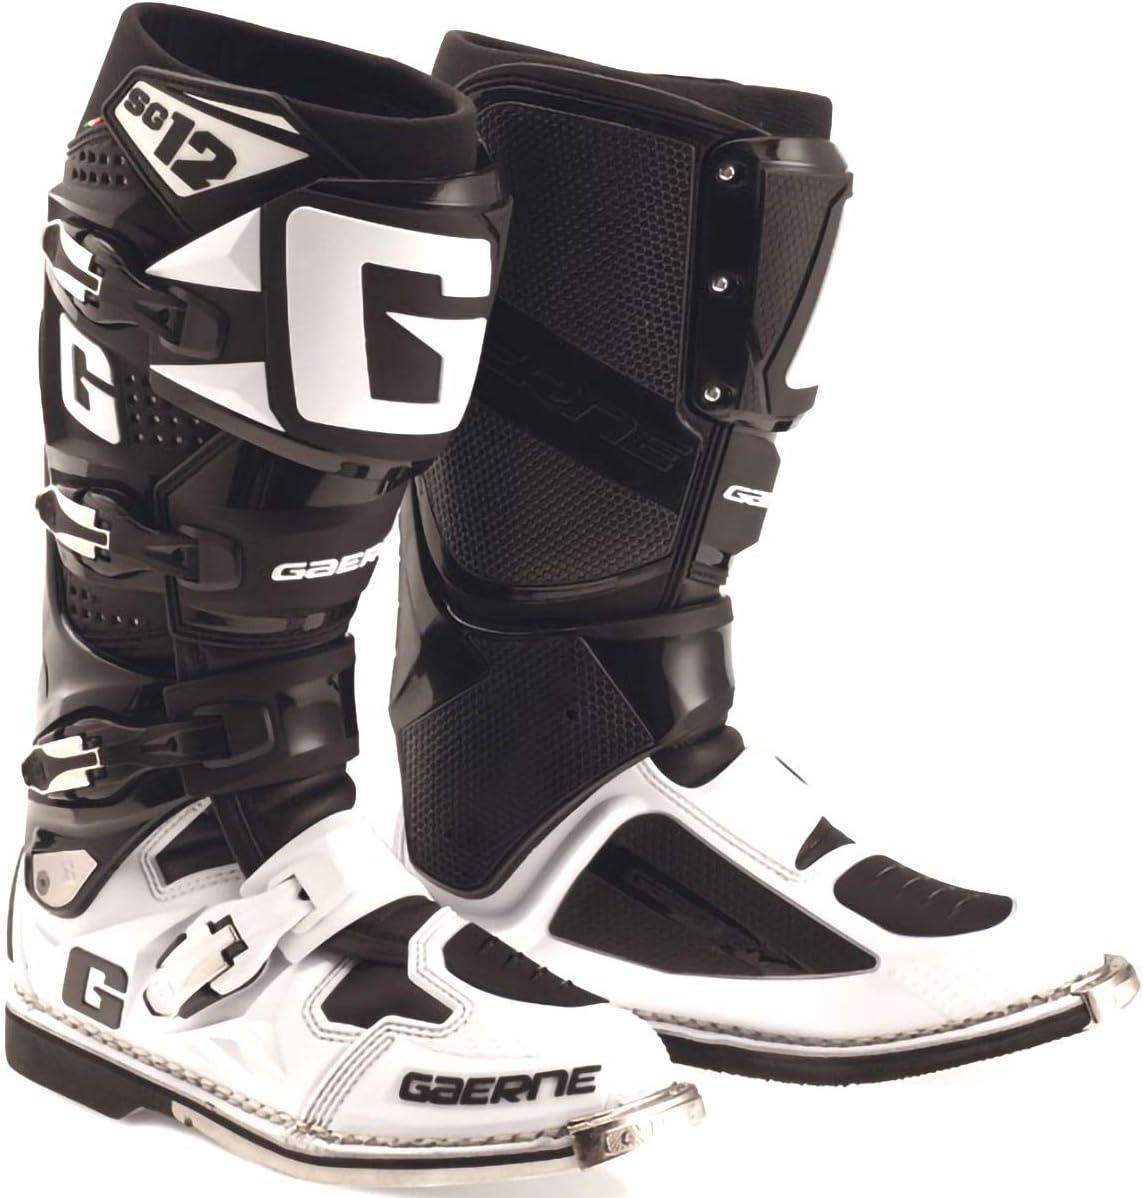 Gaerne SG-12 Boots-Black//White-9